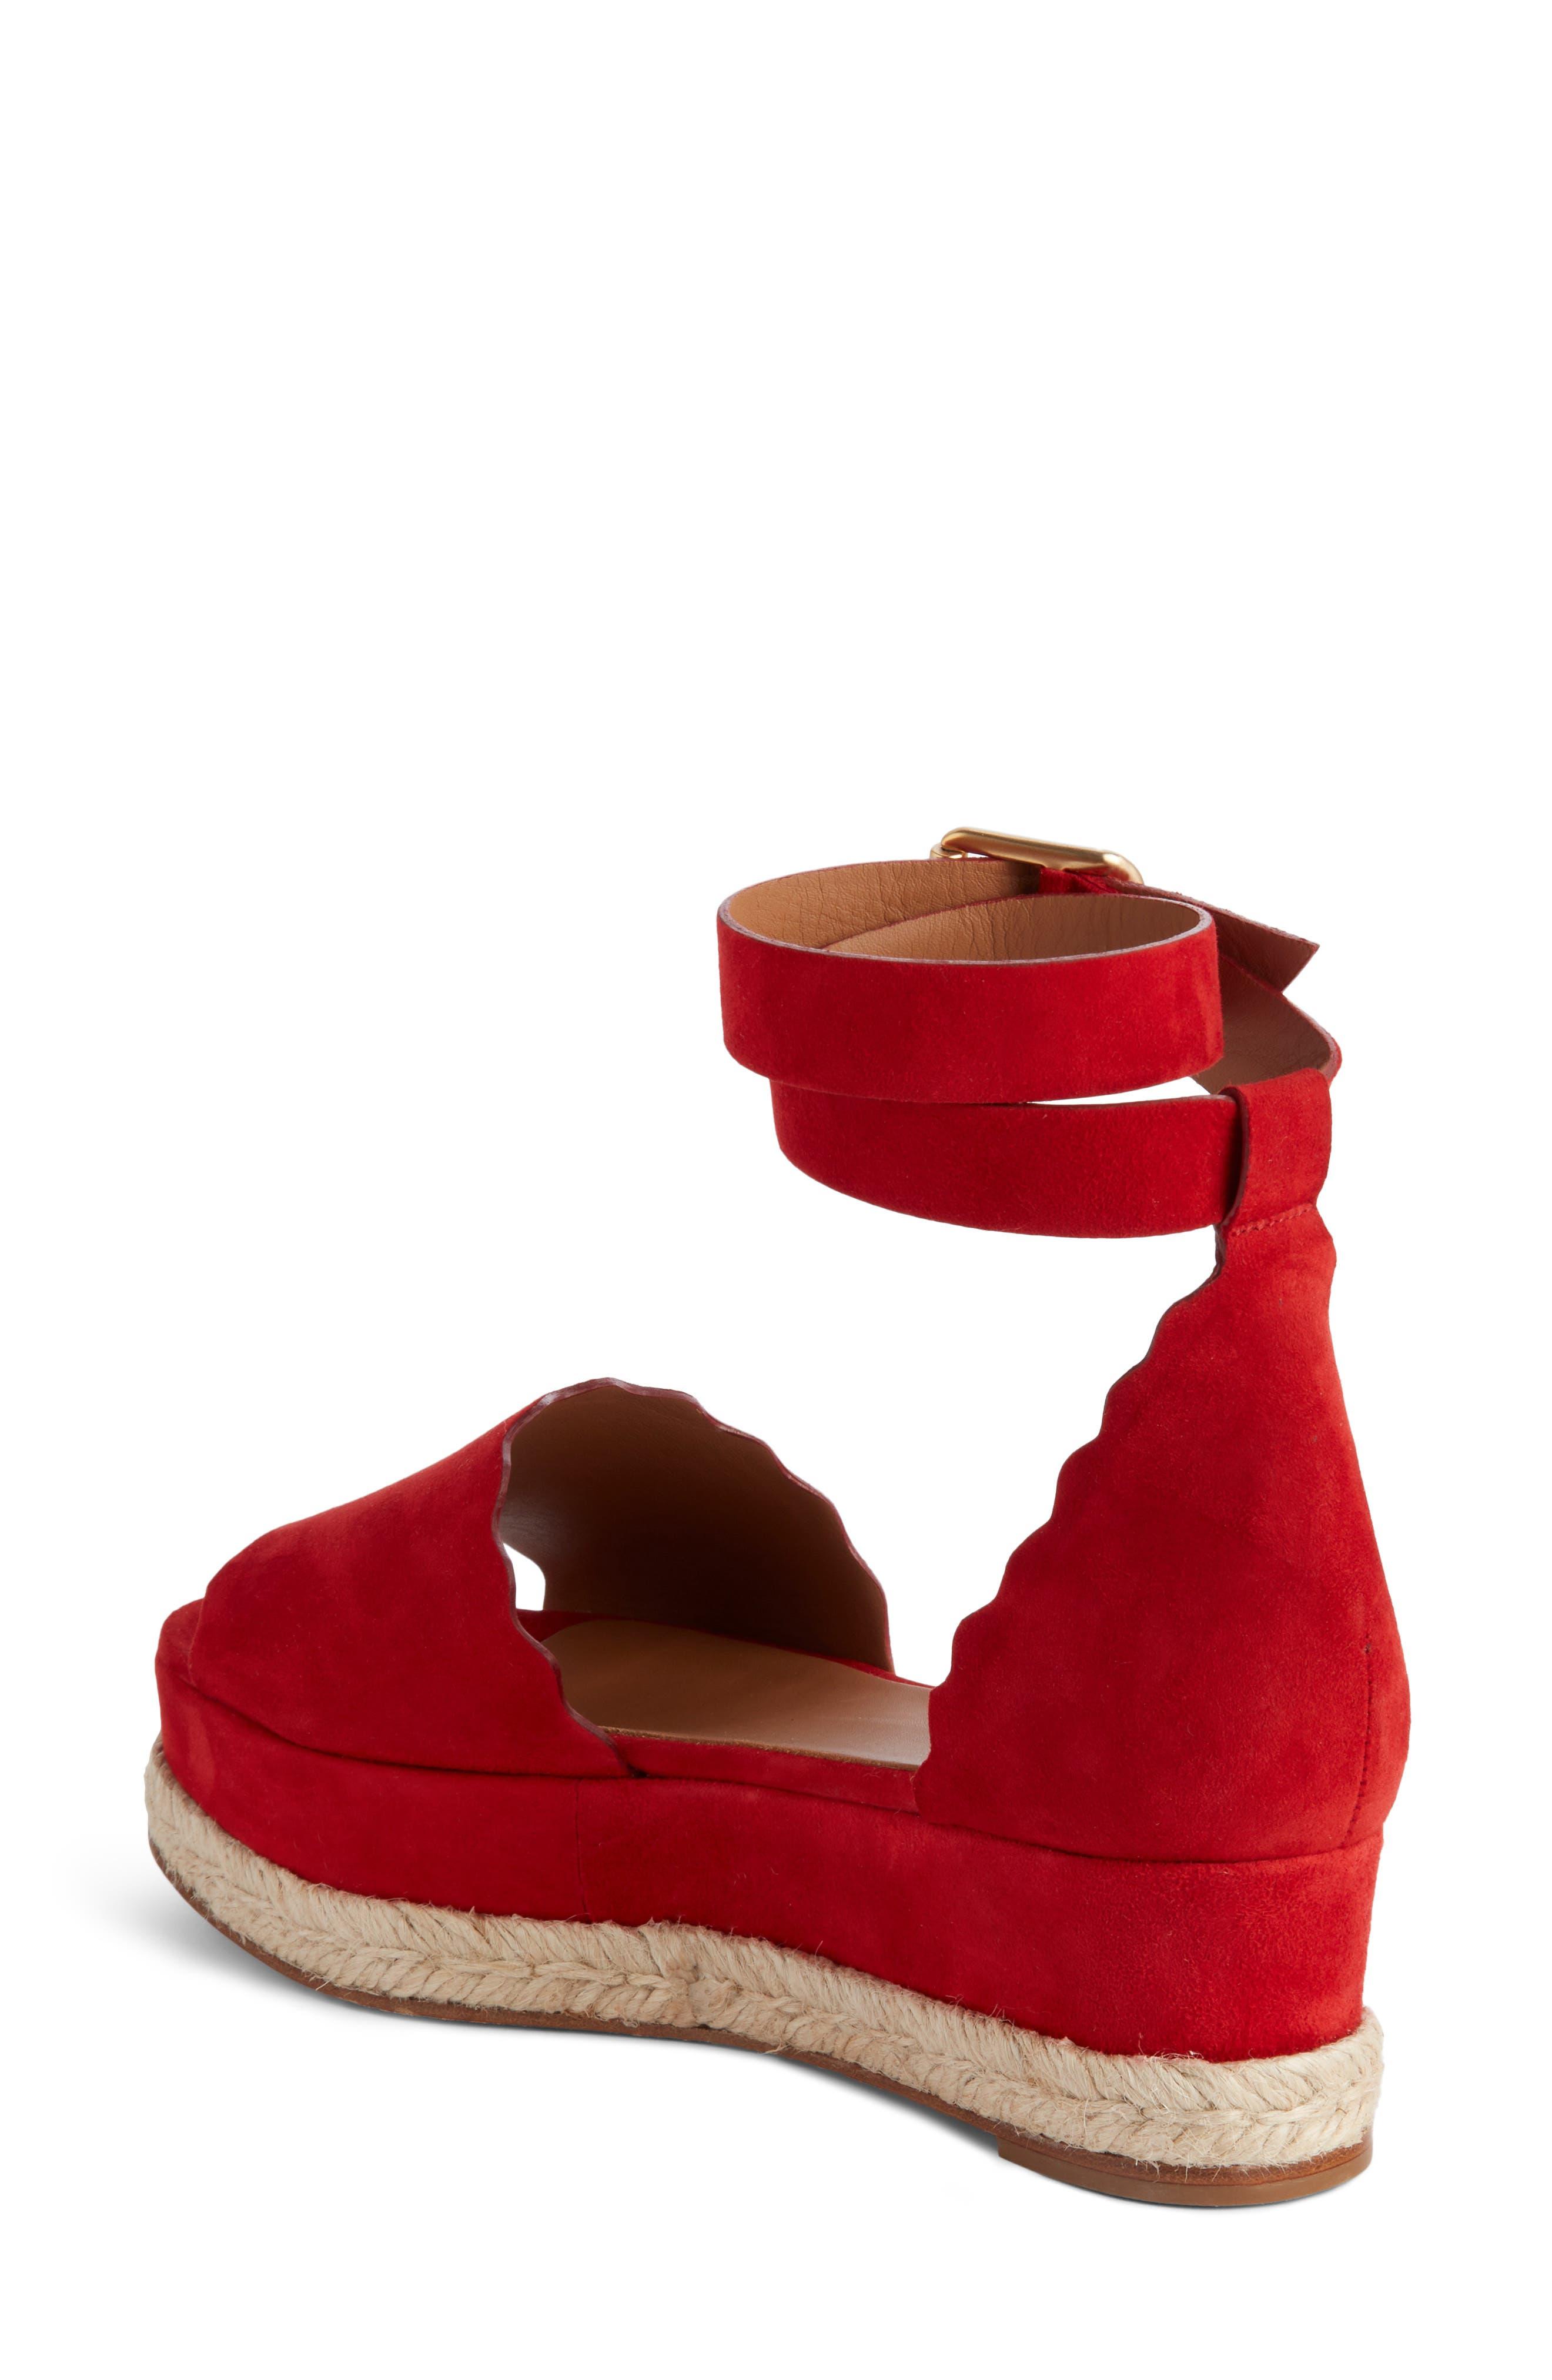 Lauren Espadrille Wedge Sandal,                             Alternate thumbnail 2, color,                             Red Flame